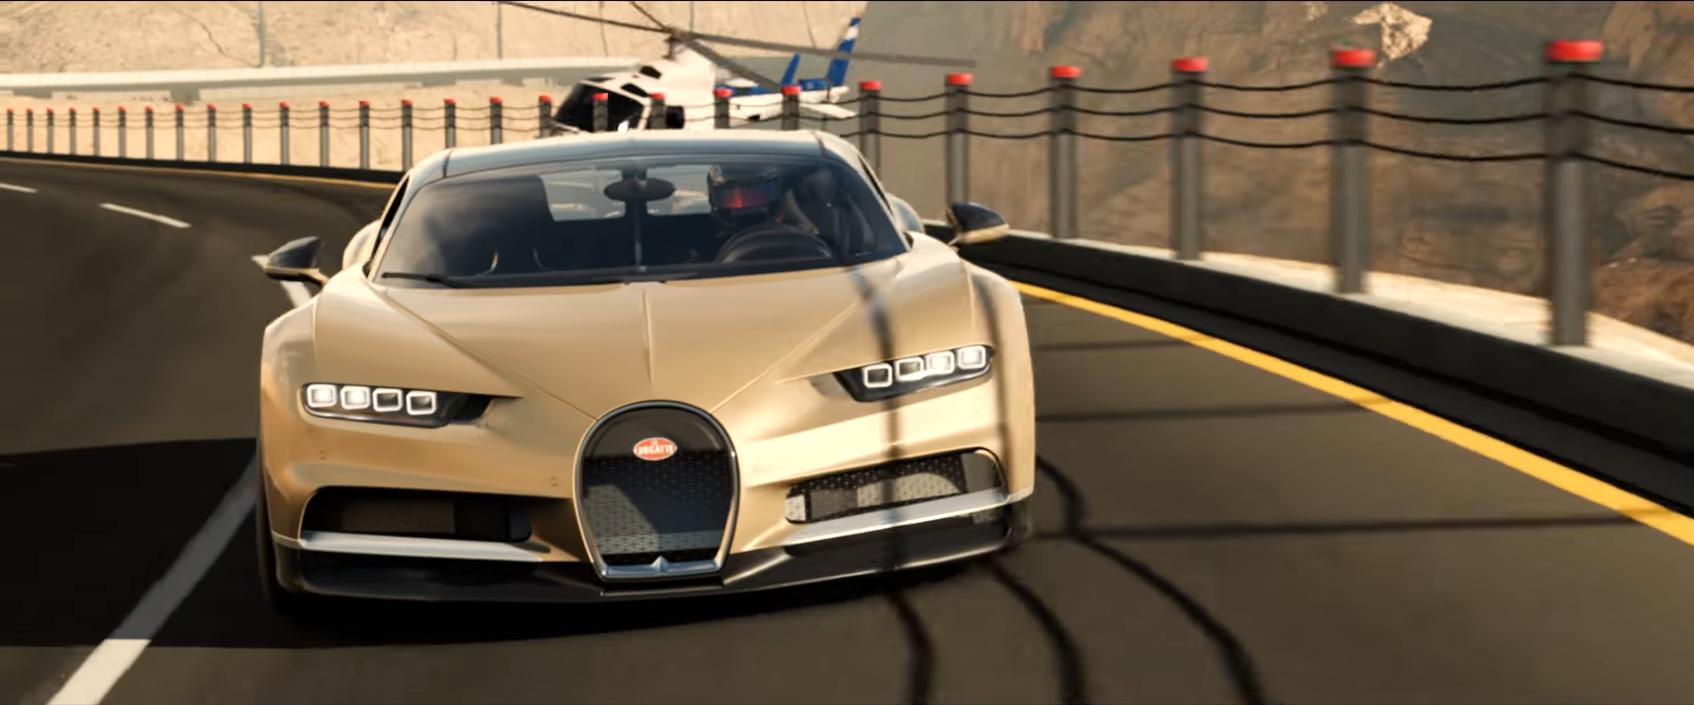 Forza Motorsport 7 Krijgt Bugatti Chiron Als Eerste